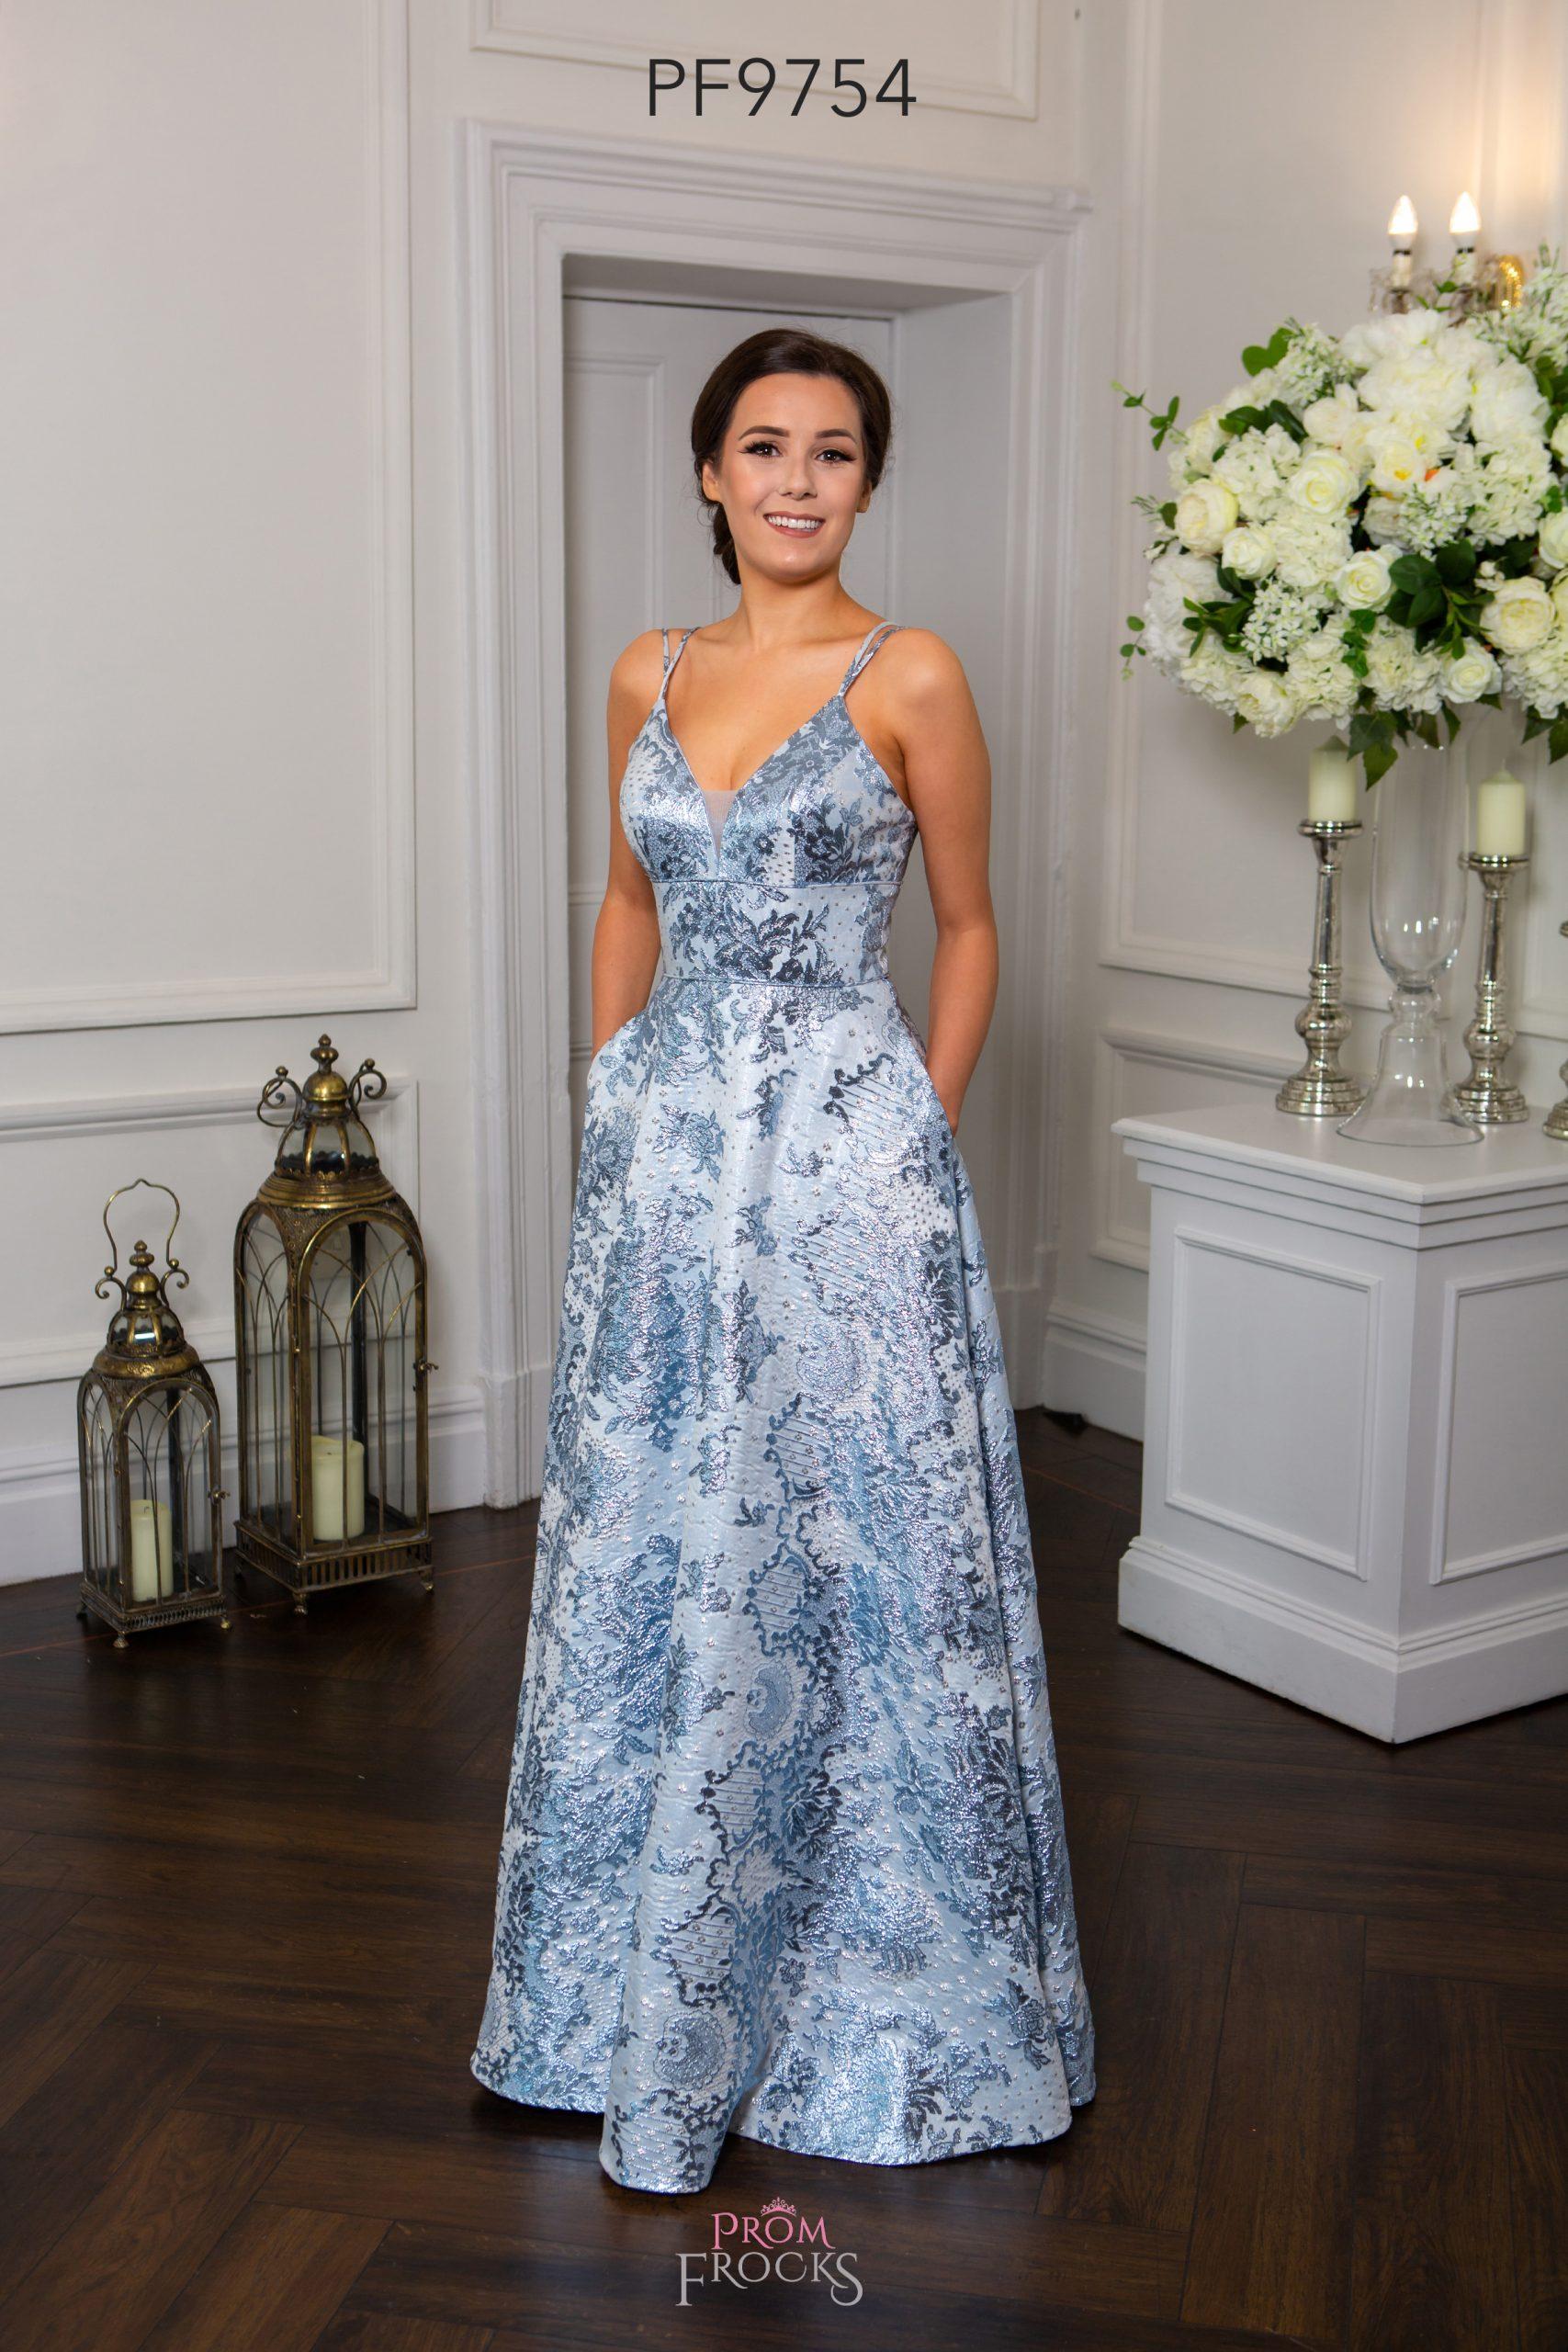 PF9754 ICE BLUE BROCADE PROM/EVENING DRESS - Prom Frocks ...